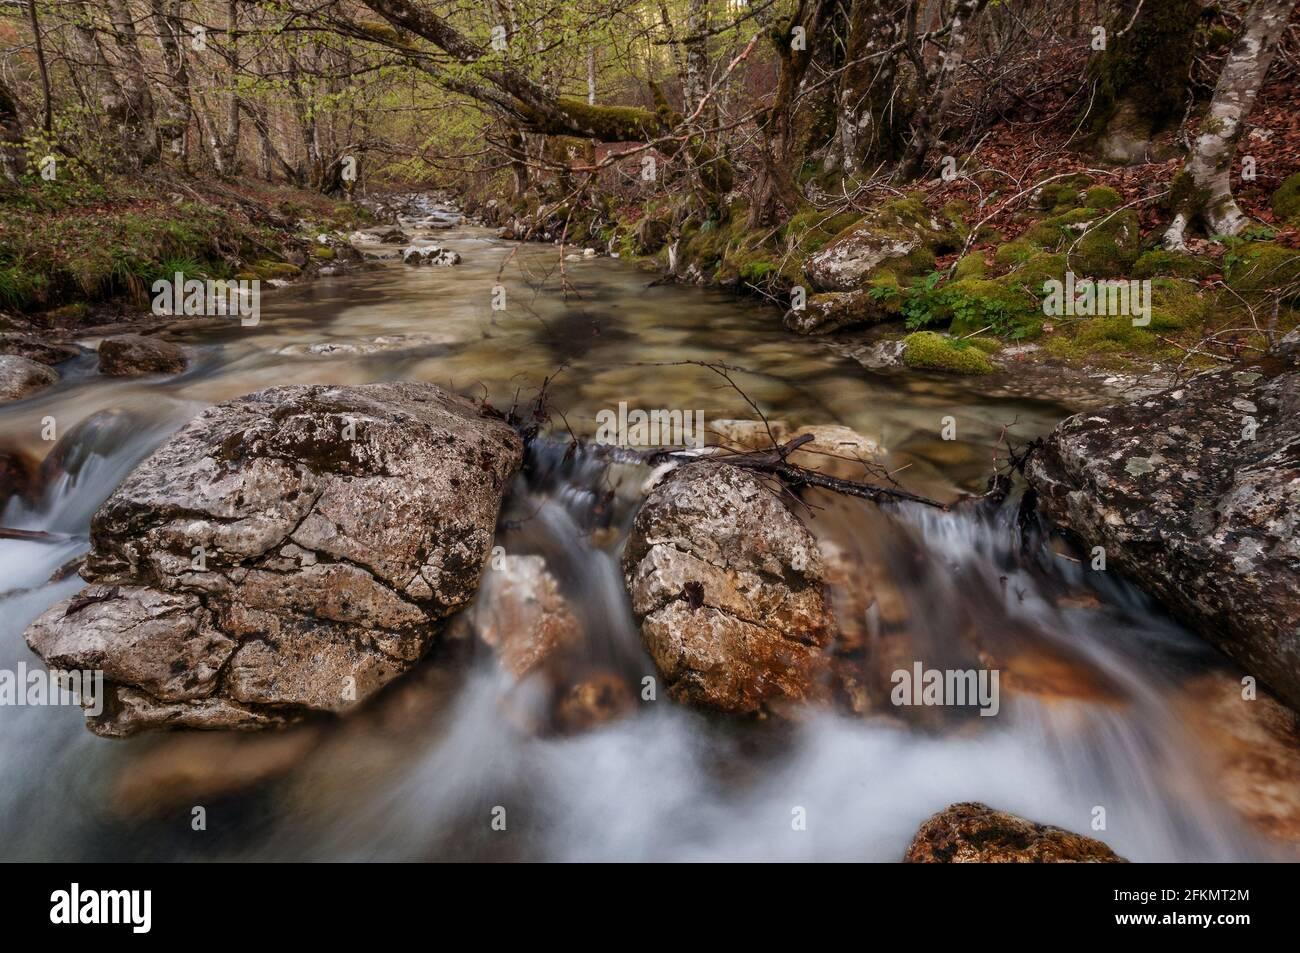 Fondillo River, Val Fondillo, Abruzzo, Latium et Molise National Park, Abruzzo, Italie, Europe Banque D'Images